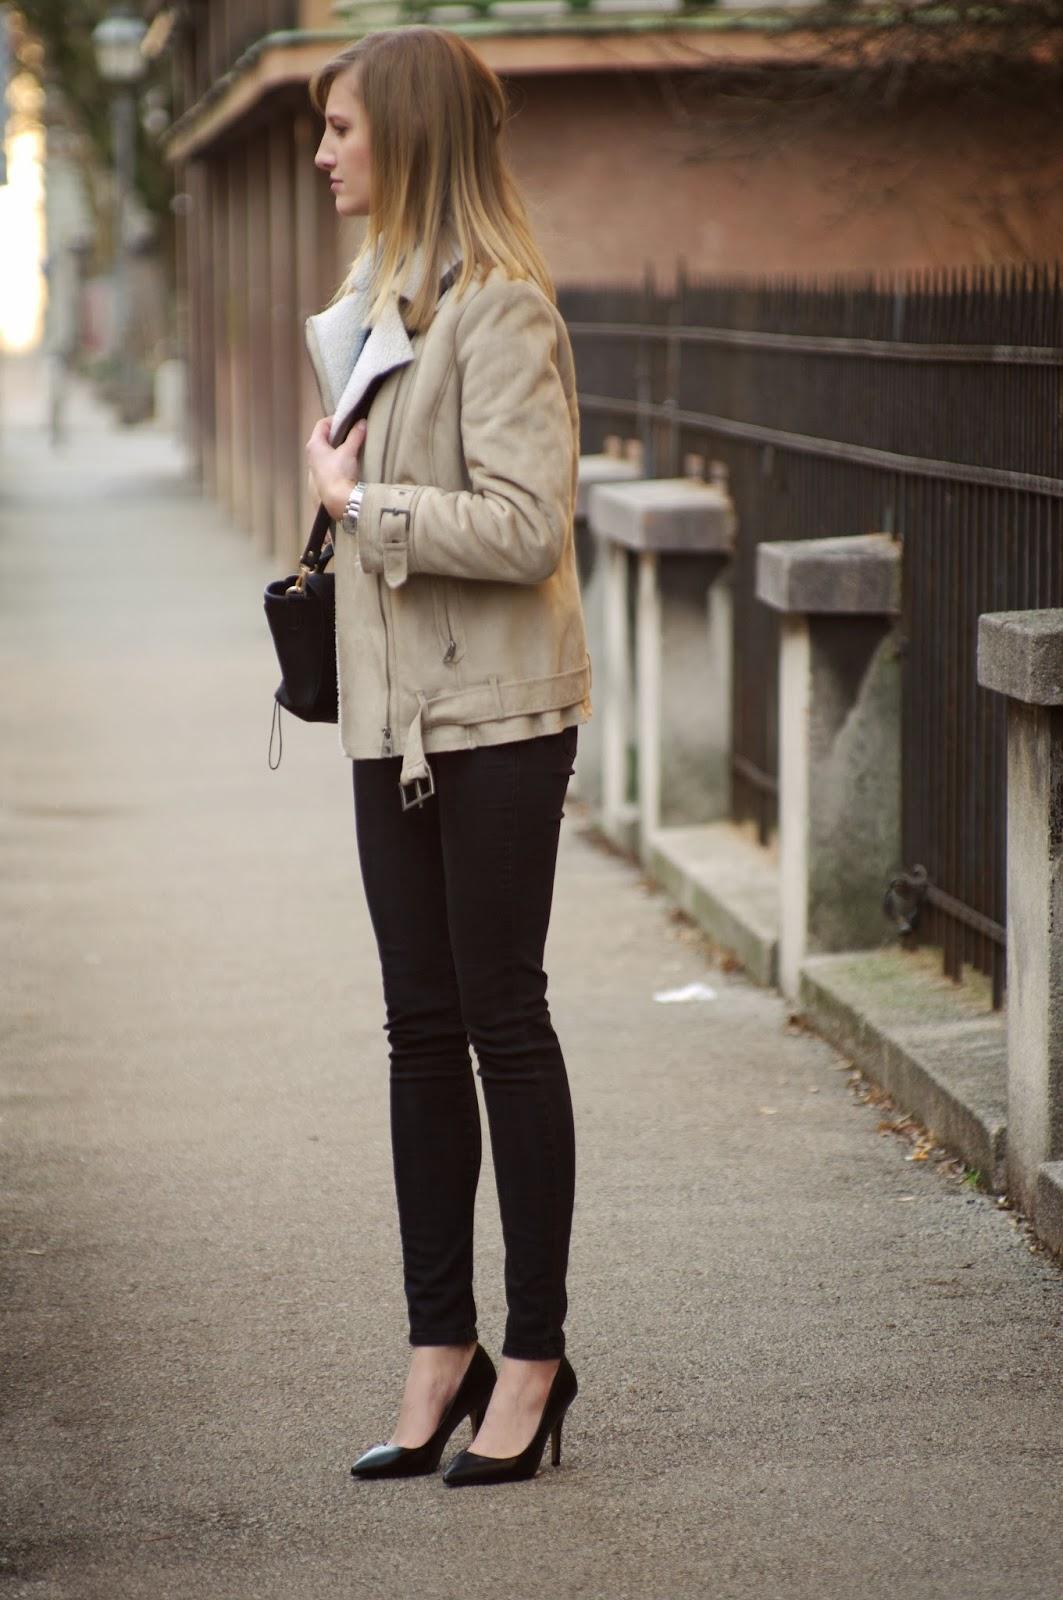 shearling jacket, hm nude sheep jacket, denim shirt, phillip lim mini pashli bag lookalike replica annaxi, pointy court heels, style blogger, fashion blog blogger, slovenski modni blogerji